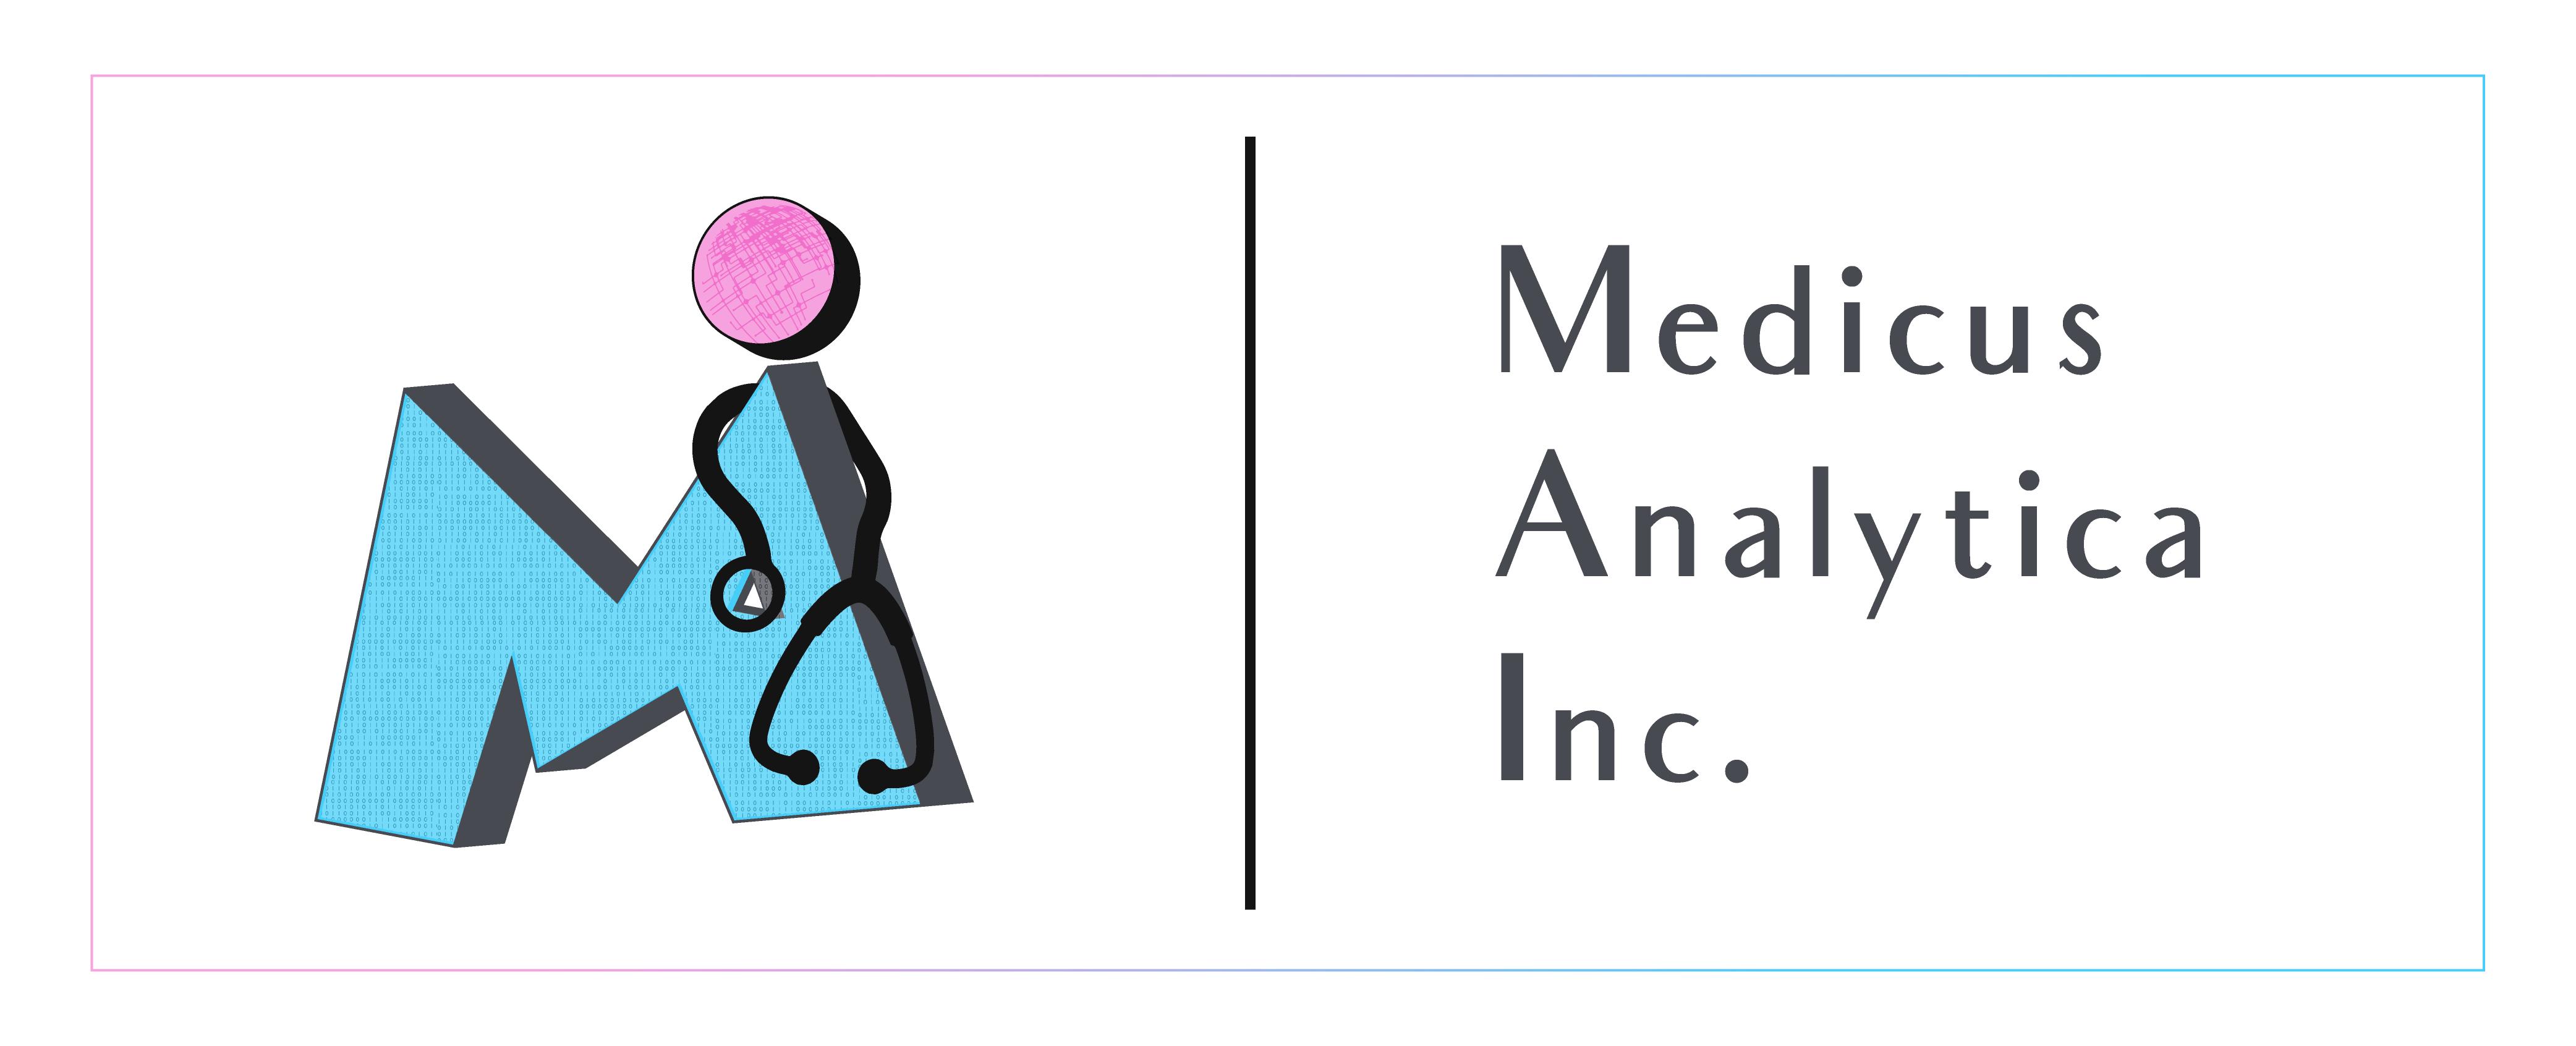 Medicus Analytica Inc.